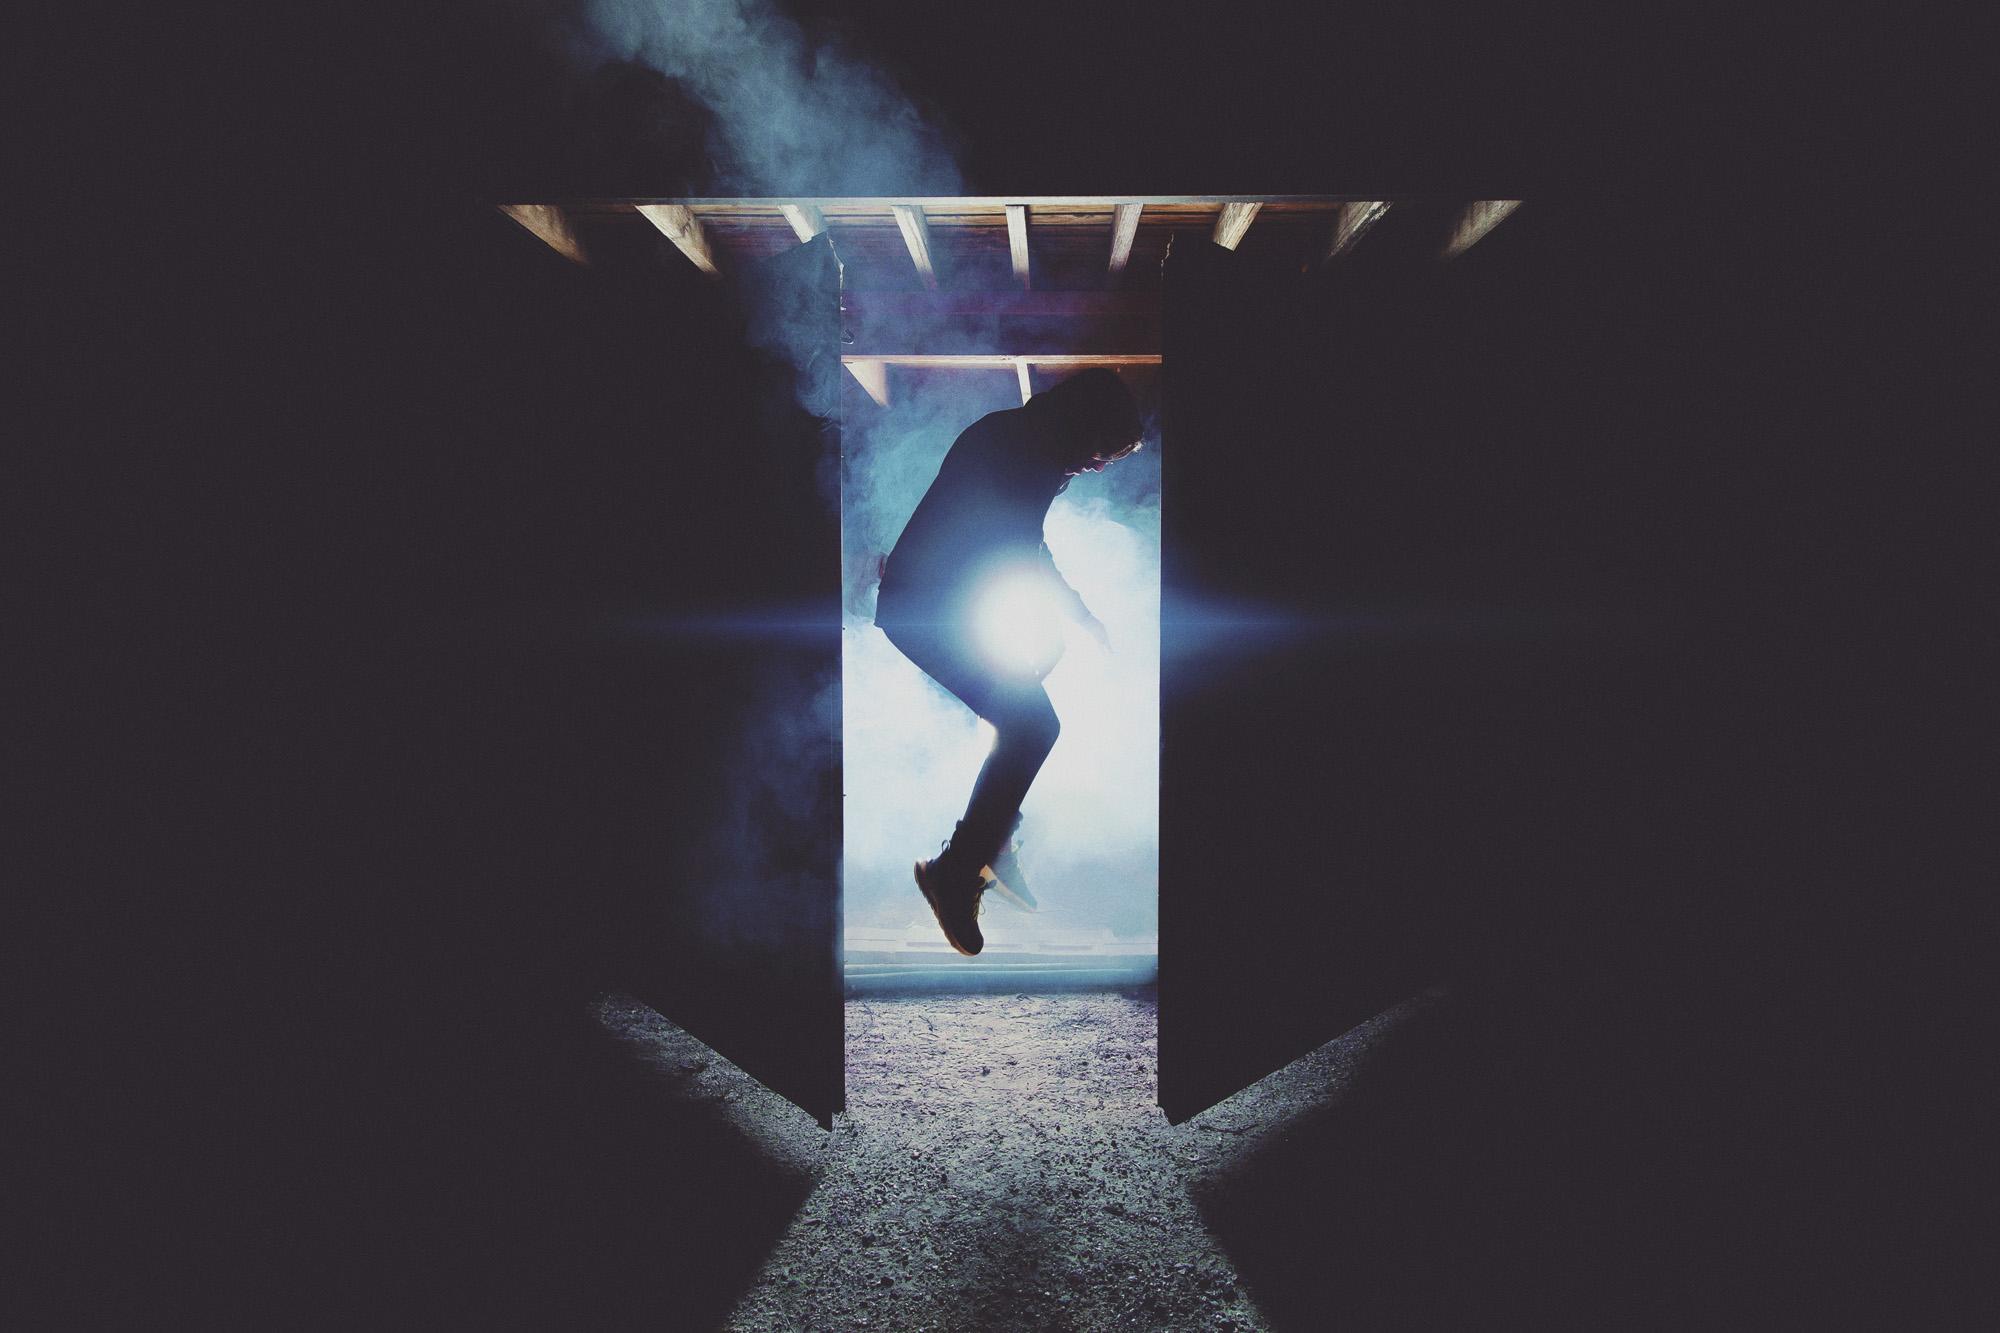 me jumping filter.jpg